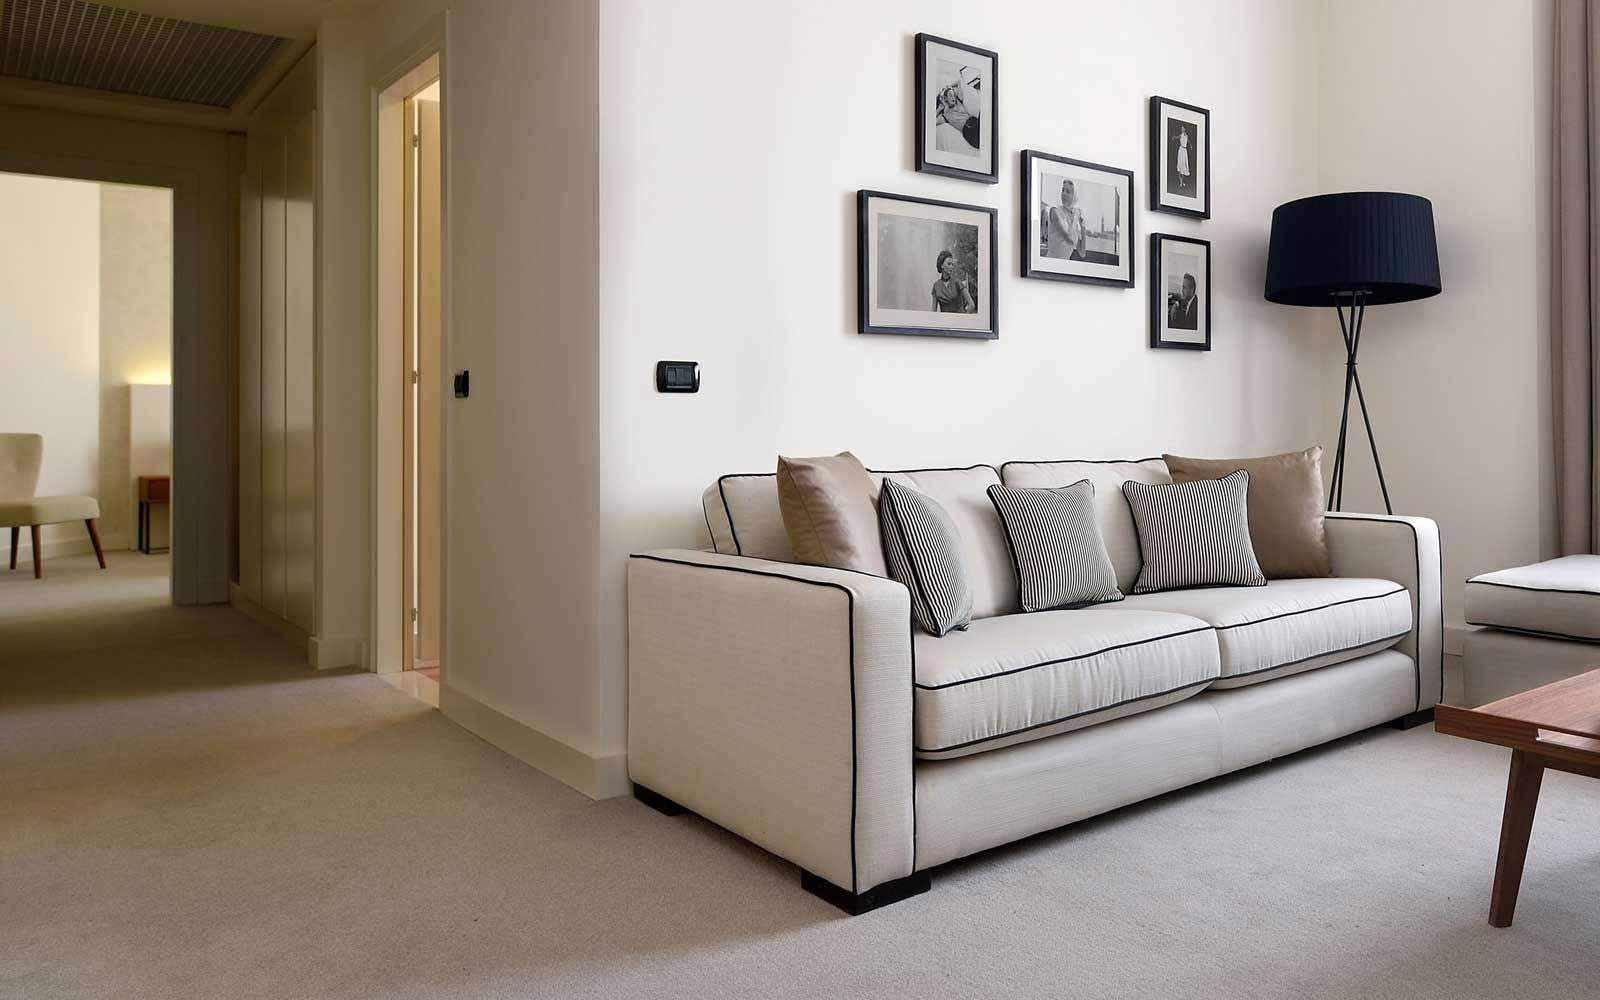 Studio Suite Sitting Room at JW Marriott Venice Resort & Spa